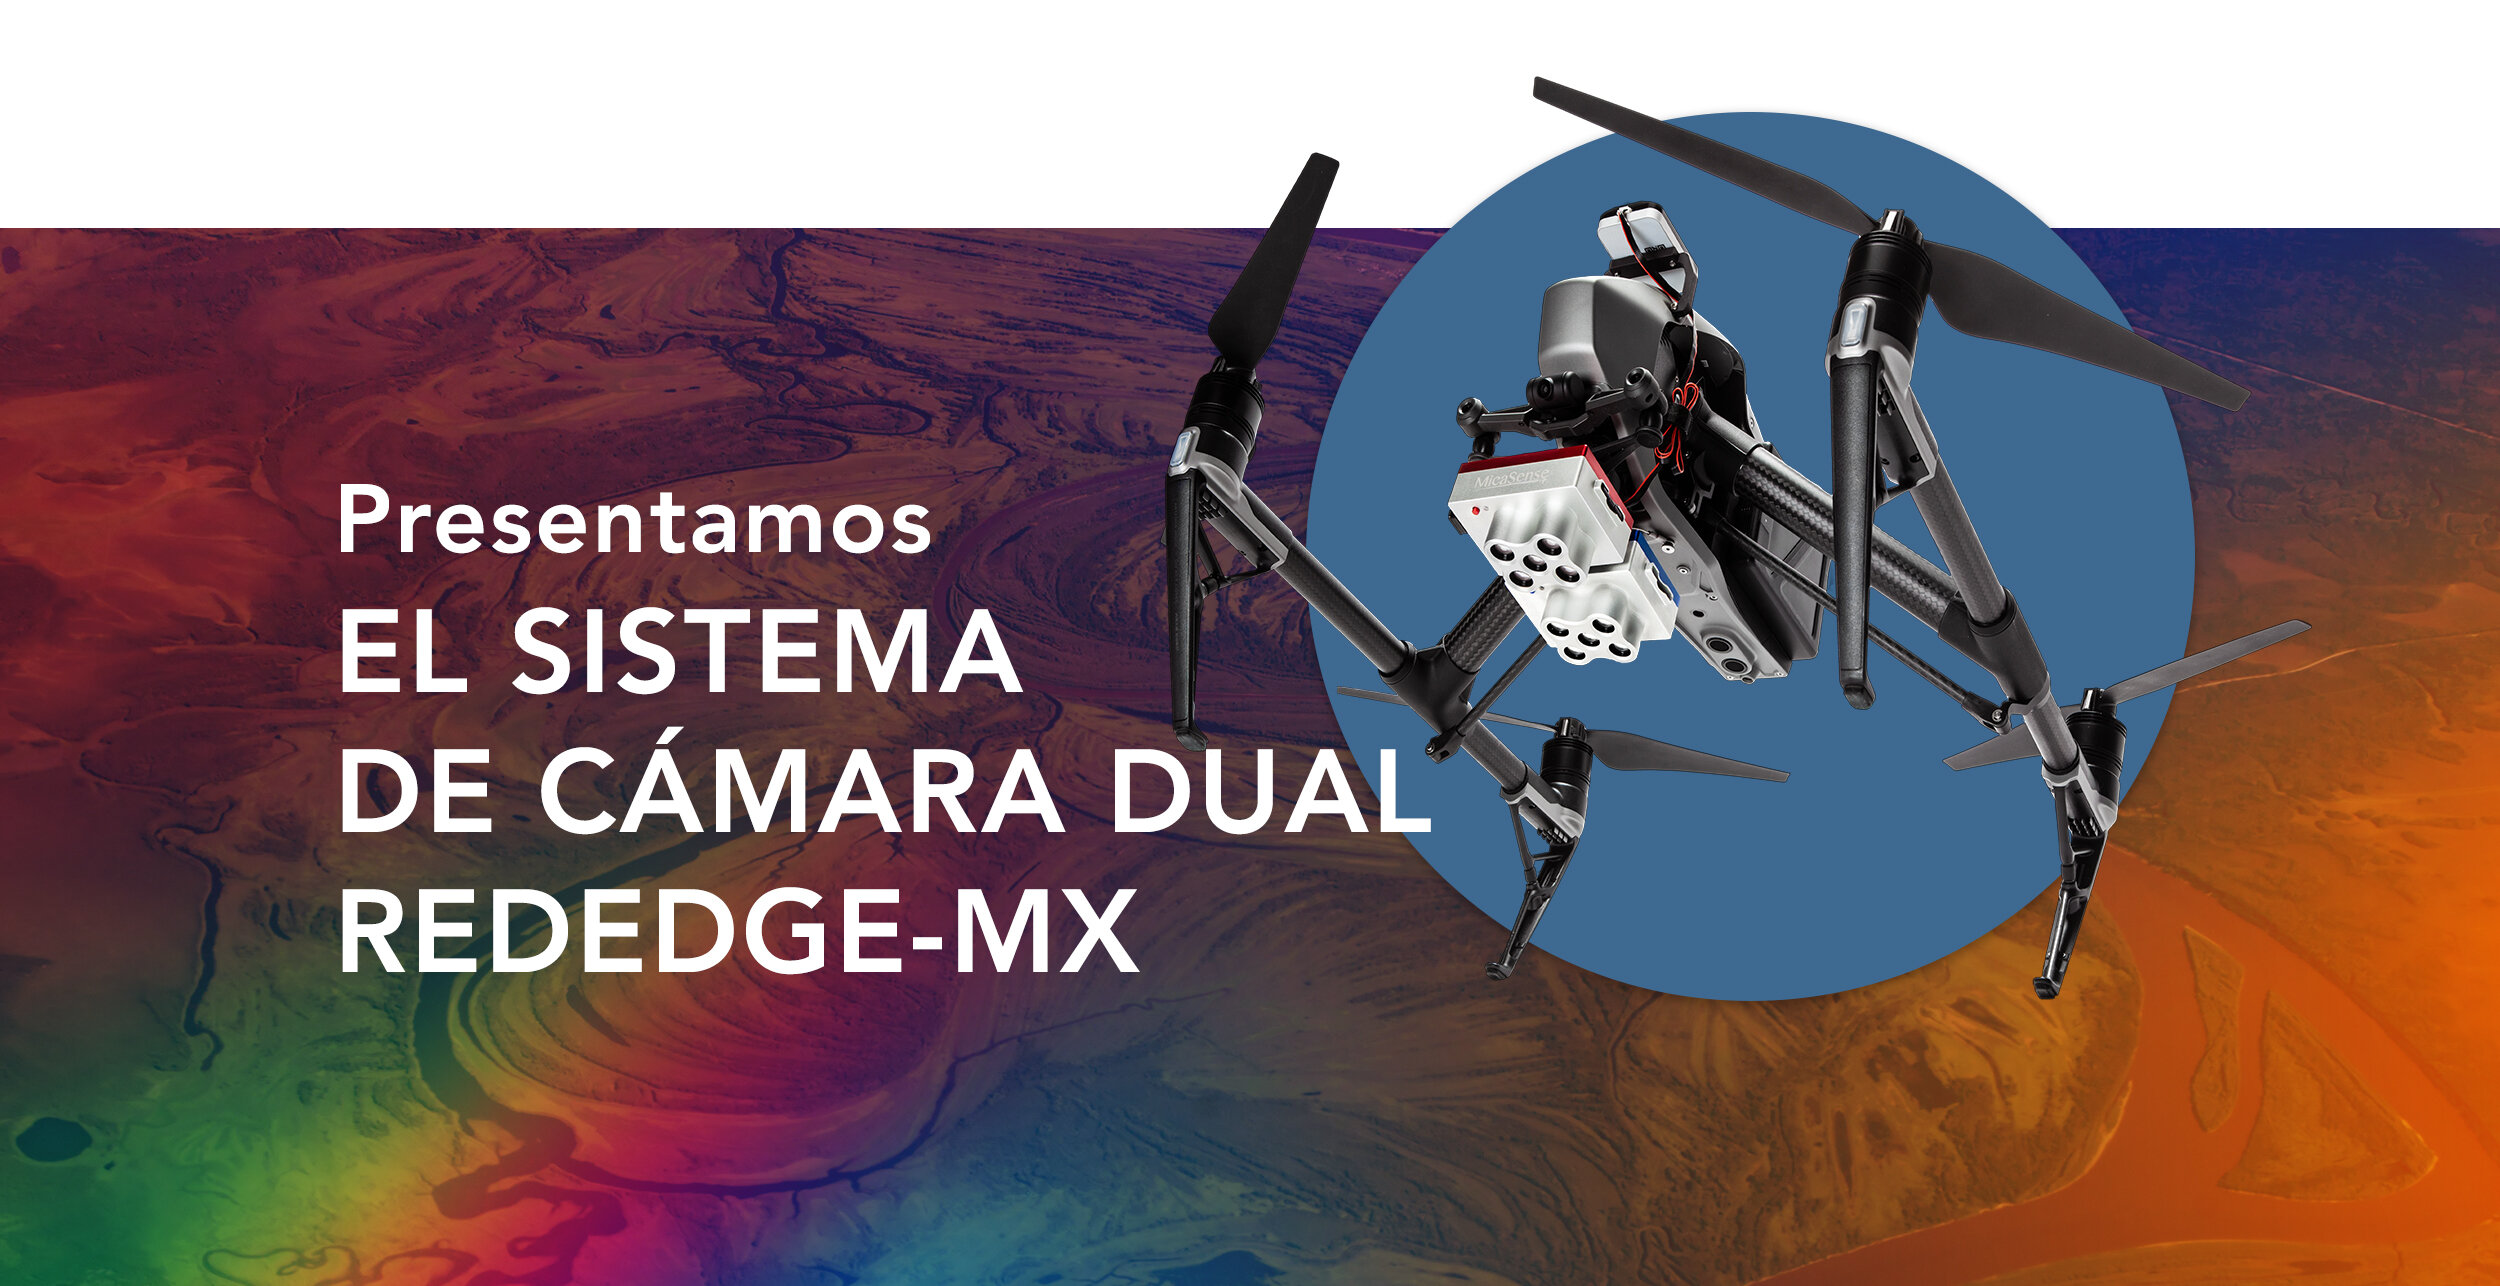 REX Blue Banner Launch Spanish.jpg